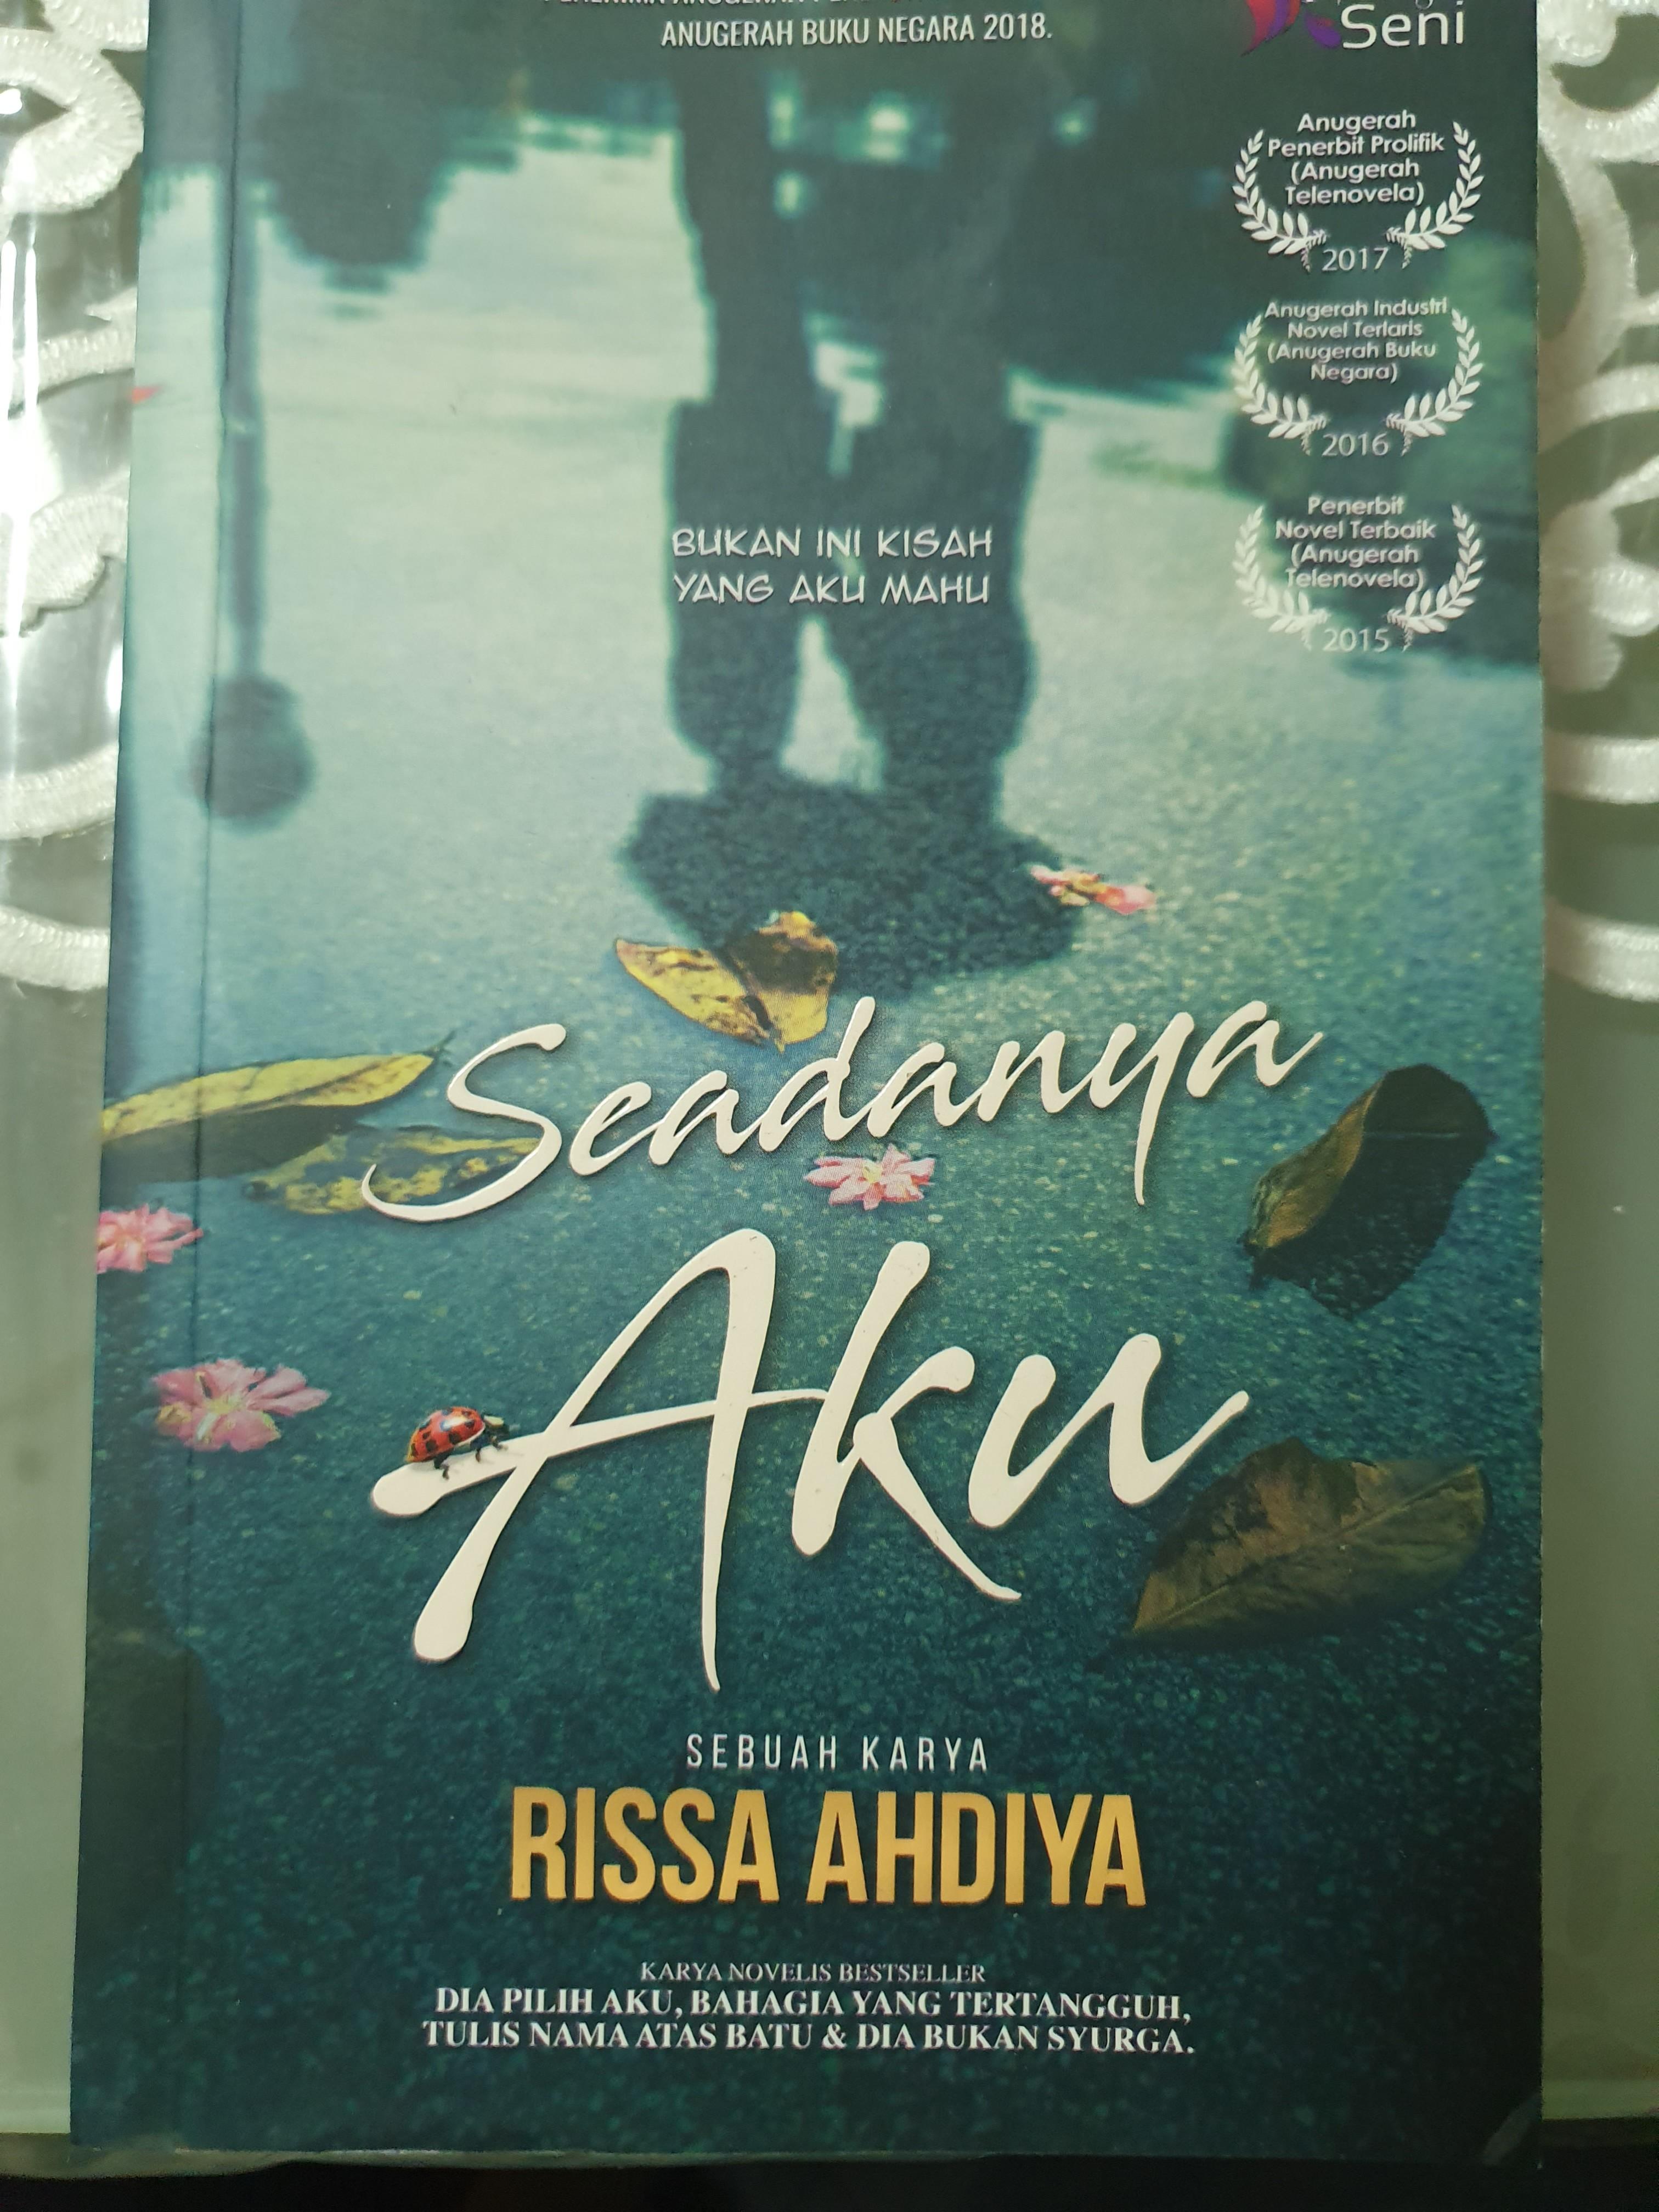 Novel Terbaru Di Kaki Novel Mei 2017 Novel B F E Best Father Ever Novel Ti Amo Sweetheart 100 Hari Novel Mencari Hilang Mukah Pages Media Marketing Make Easy With